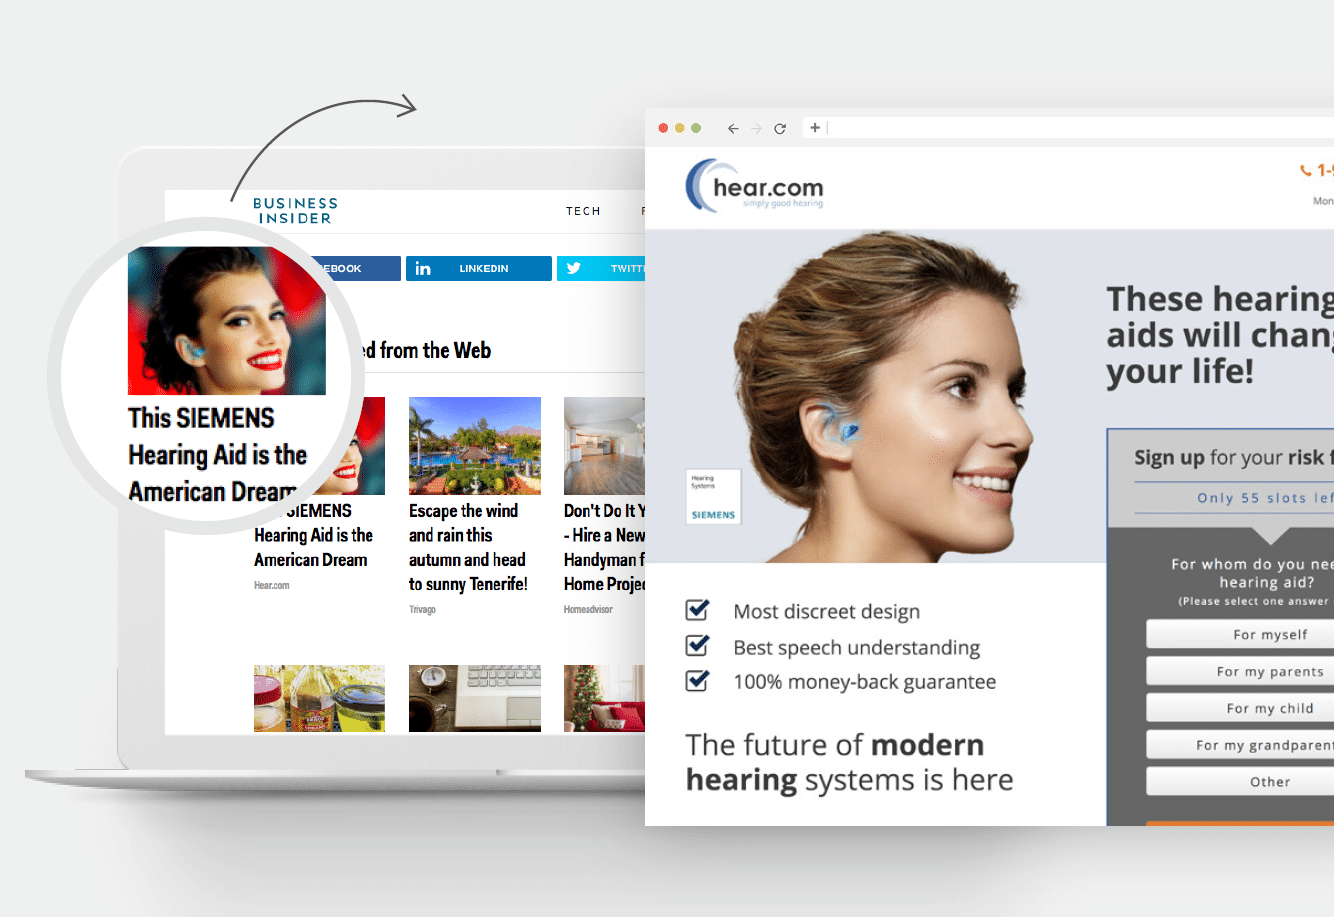 hear.com content recommendation